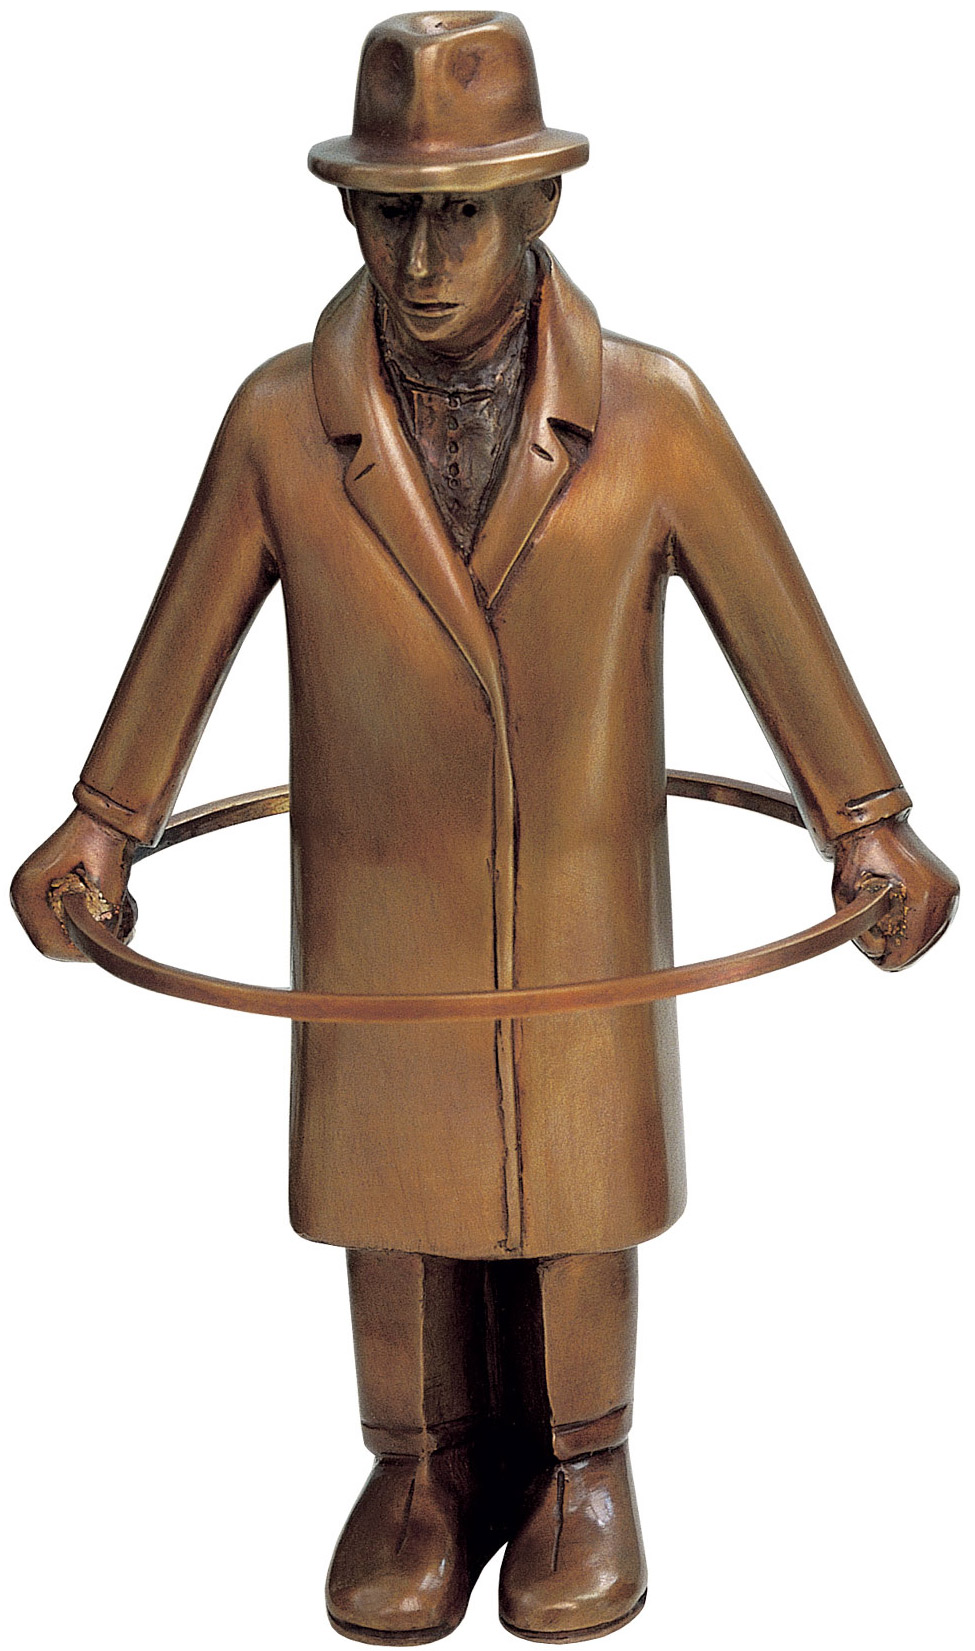 "Skulptur ""Mann mit Reifen - Noli me tangere!"", Bronze"